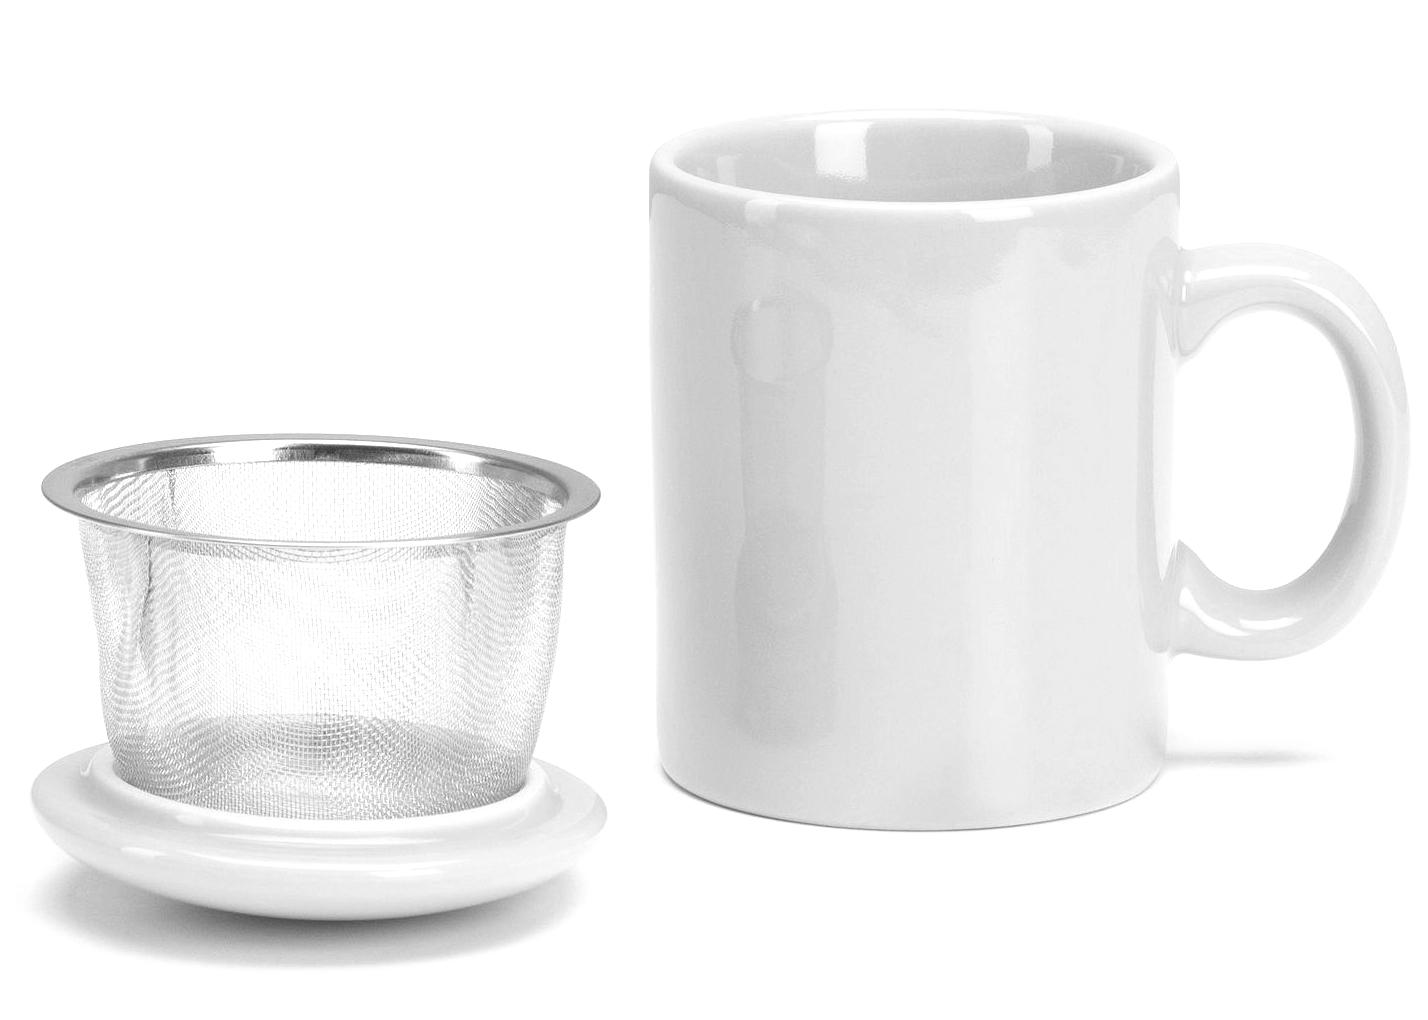 Omniware White Ceramic Infuser Tea Mug with Lid